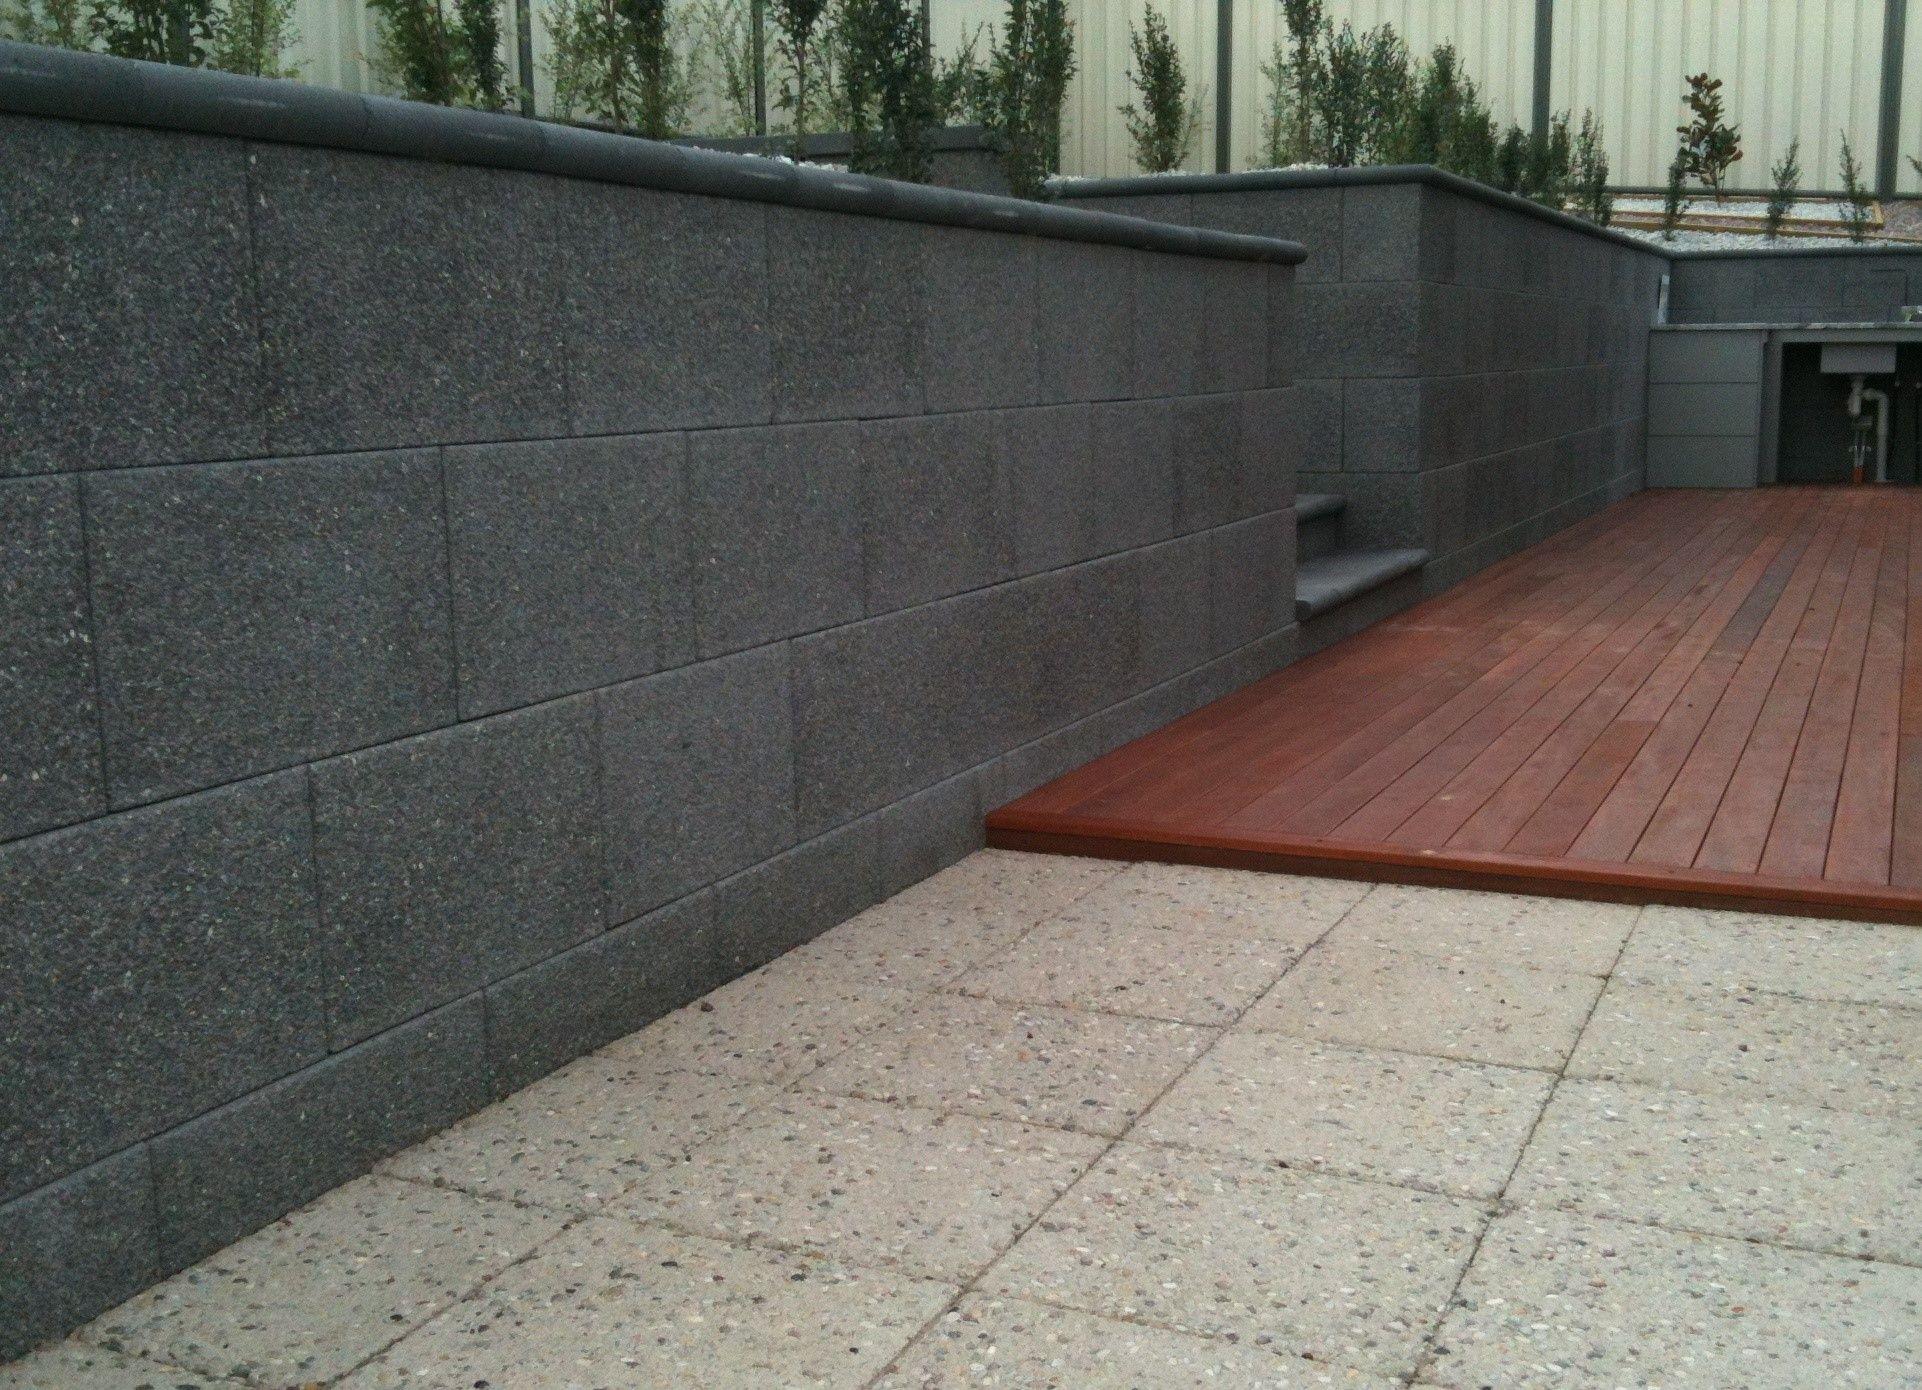 Charcoal Dark Grey Ecostone Retaining Wall Backyard Entertaining Area Concrete Retaining Walls Backyard Entertaining